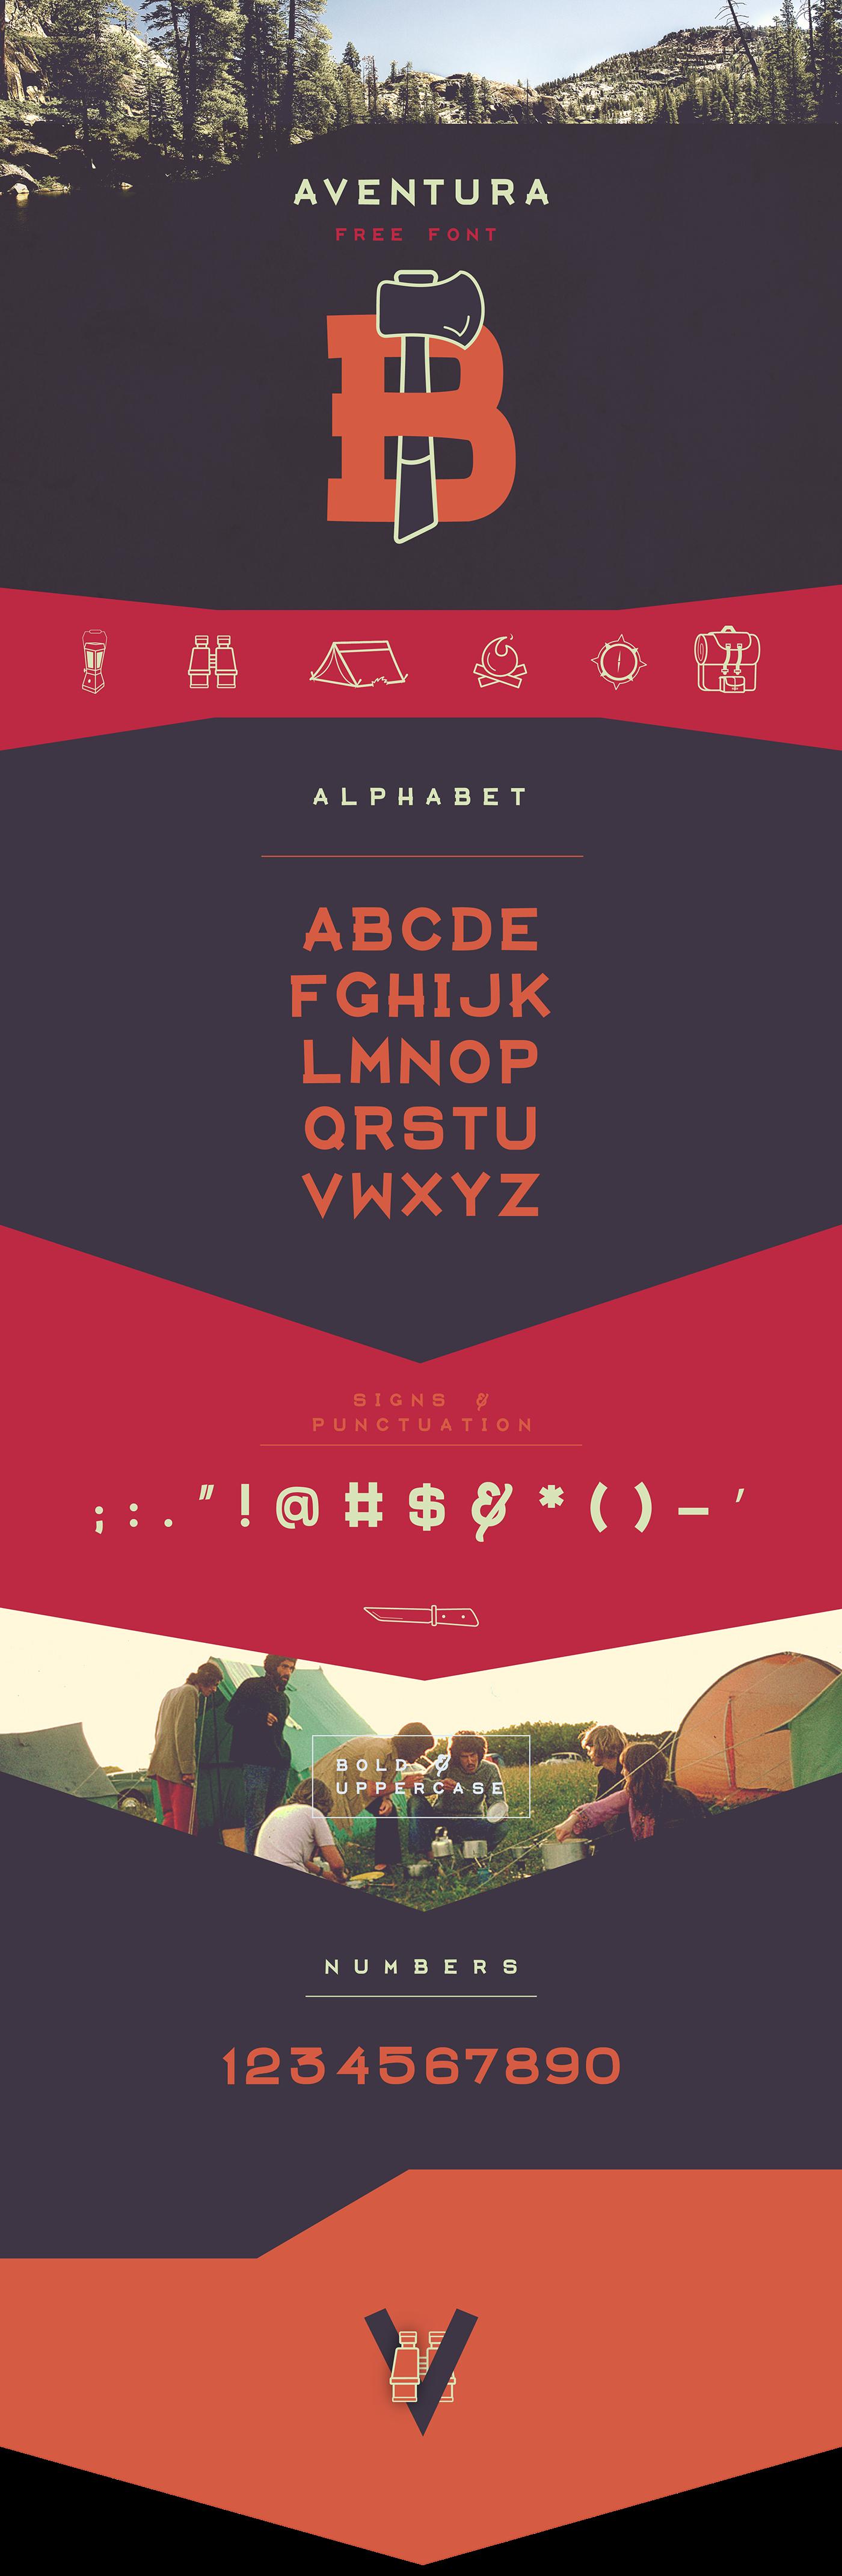 free,type,font,download,Typeface,free type,Free font,free typeface,bold,adventure,aventura,fonts